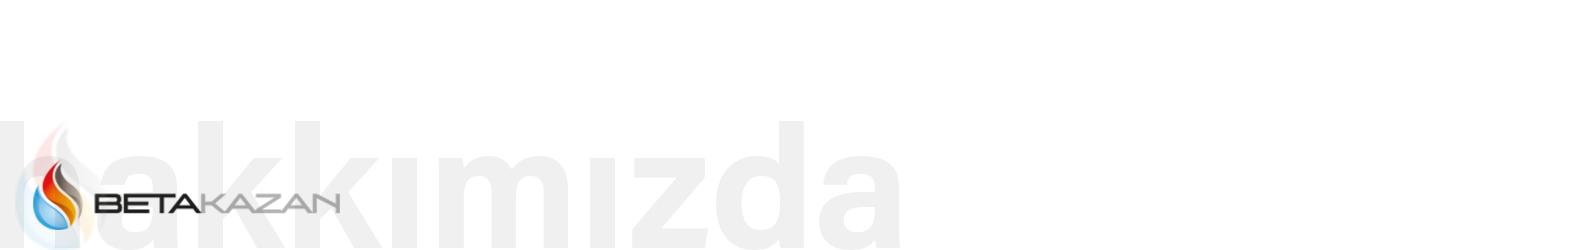 betakazan_1505674638_logo